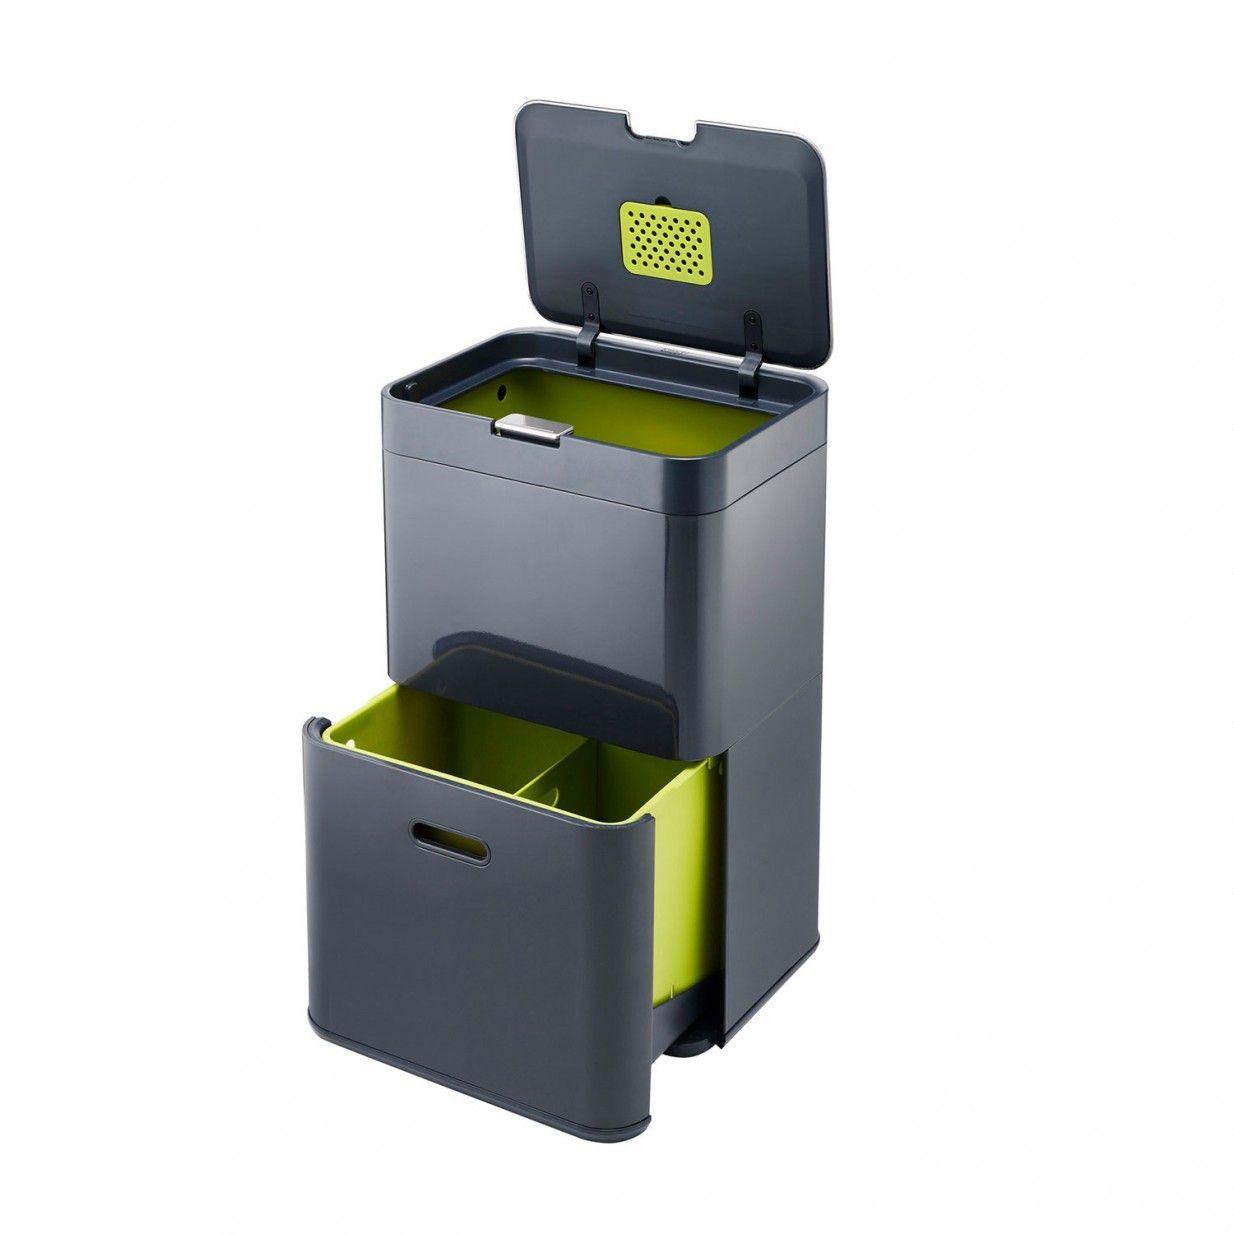 Recycling Mülleimer totem 48 mülleimer dklgrau joseph joseph interior